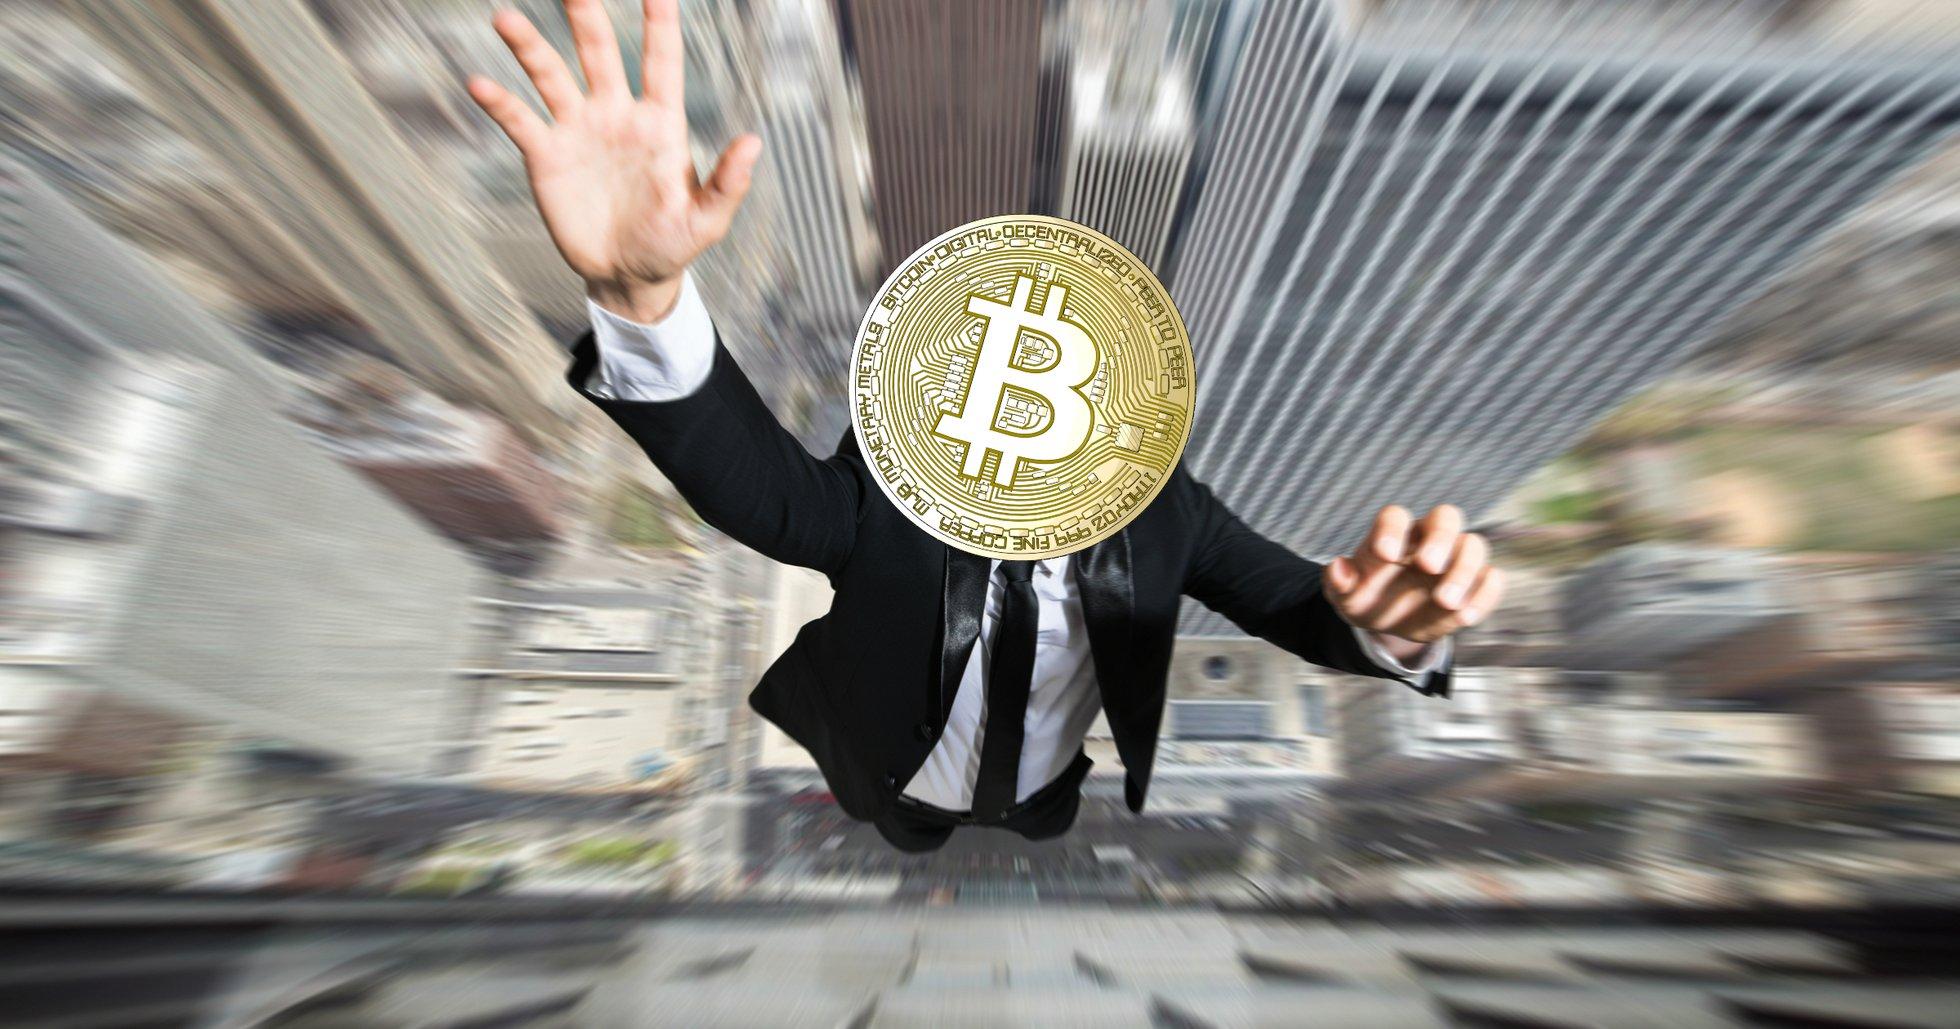 Bitcoinpriset rasar nästan 5 procent.